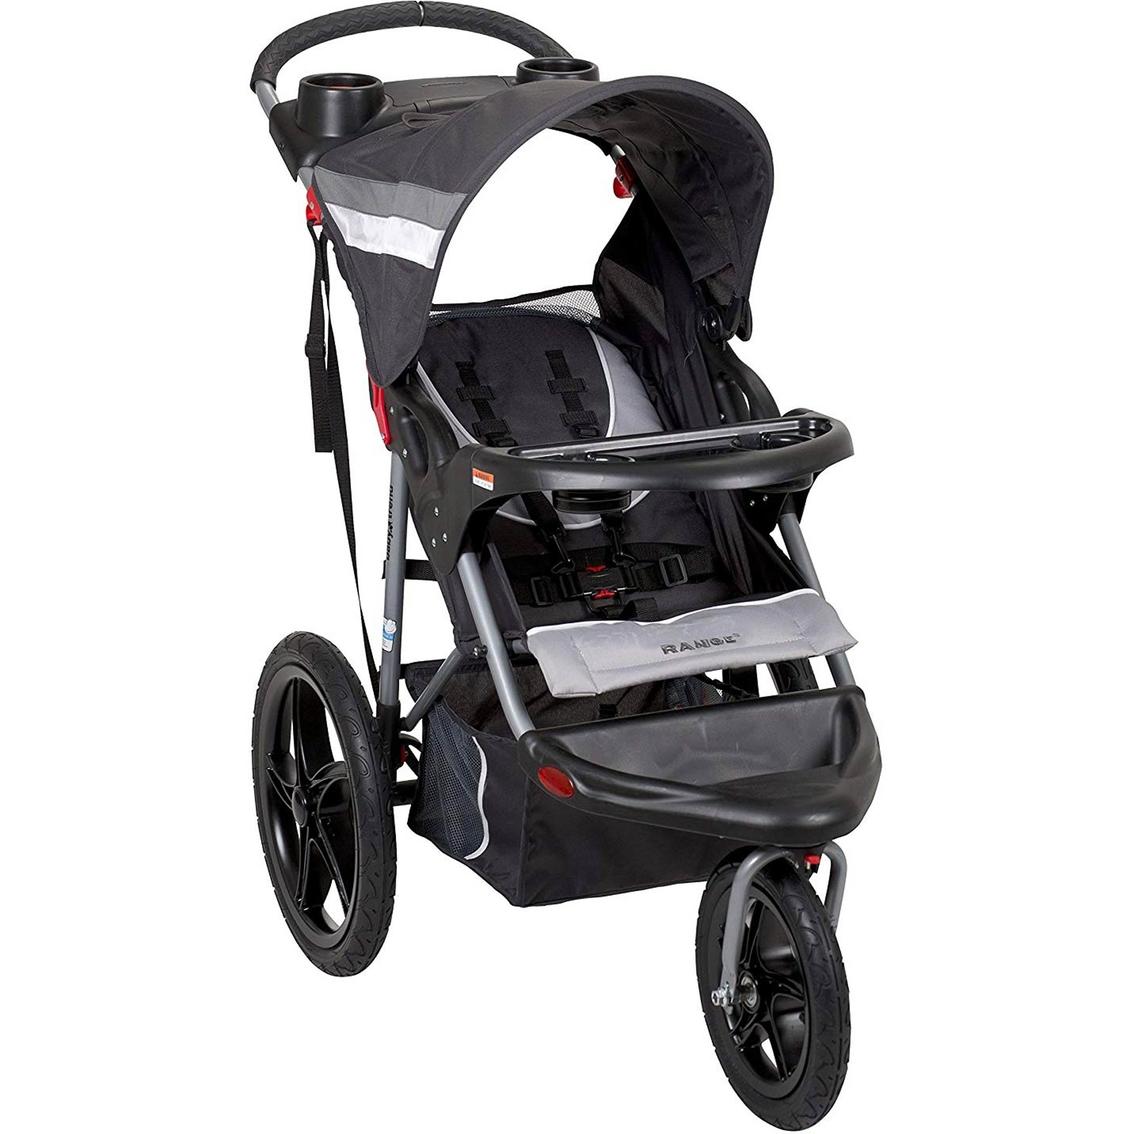 Baby Trend Liberty Range Jogging Stroller | Jogging | Baby ...